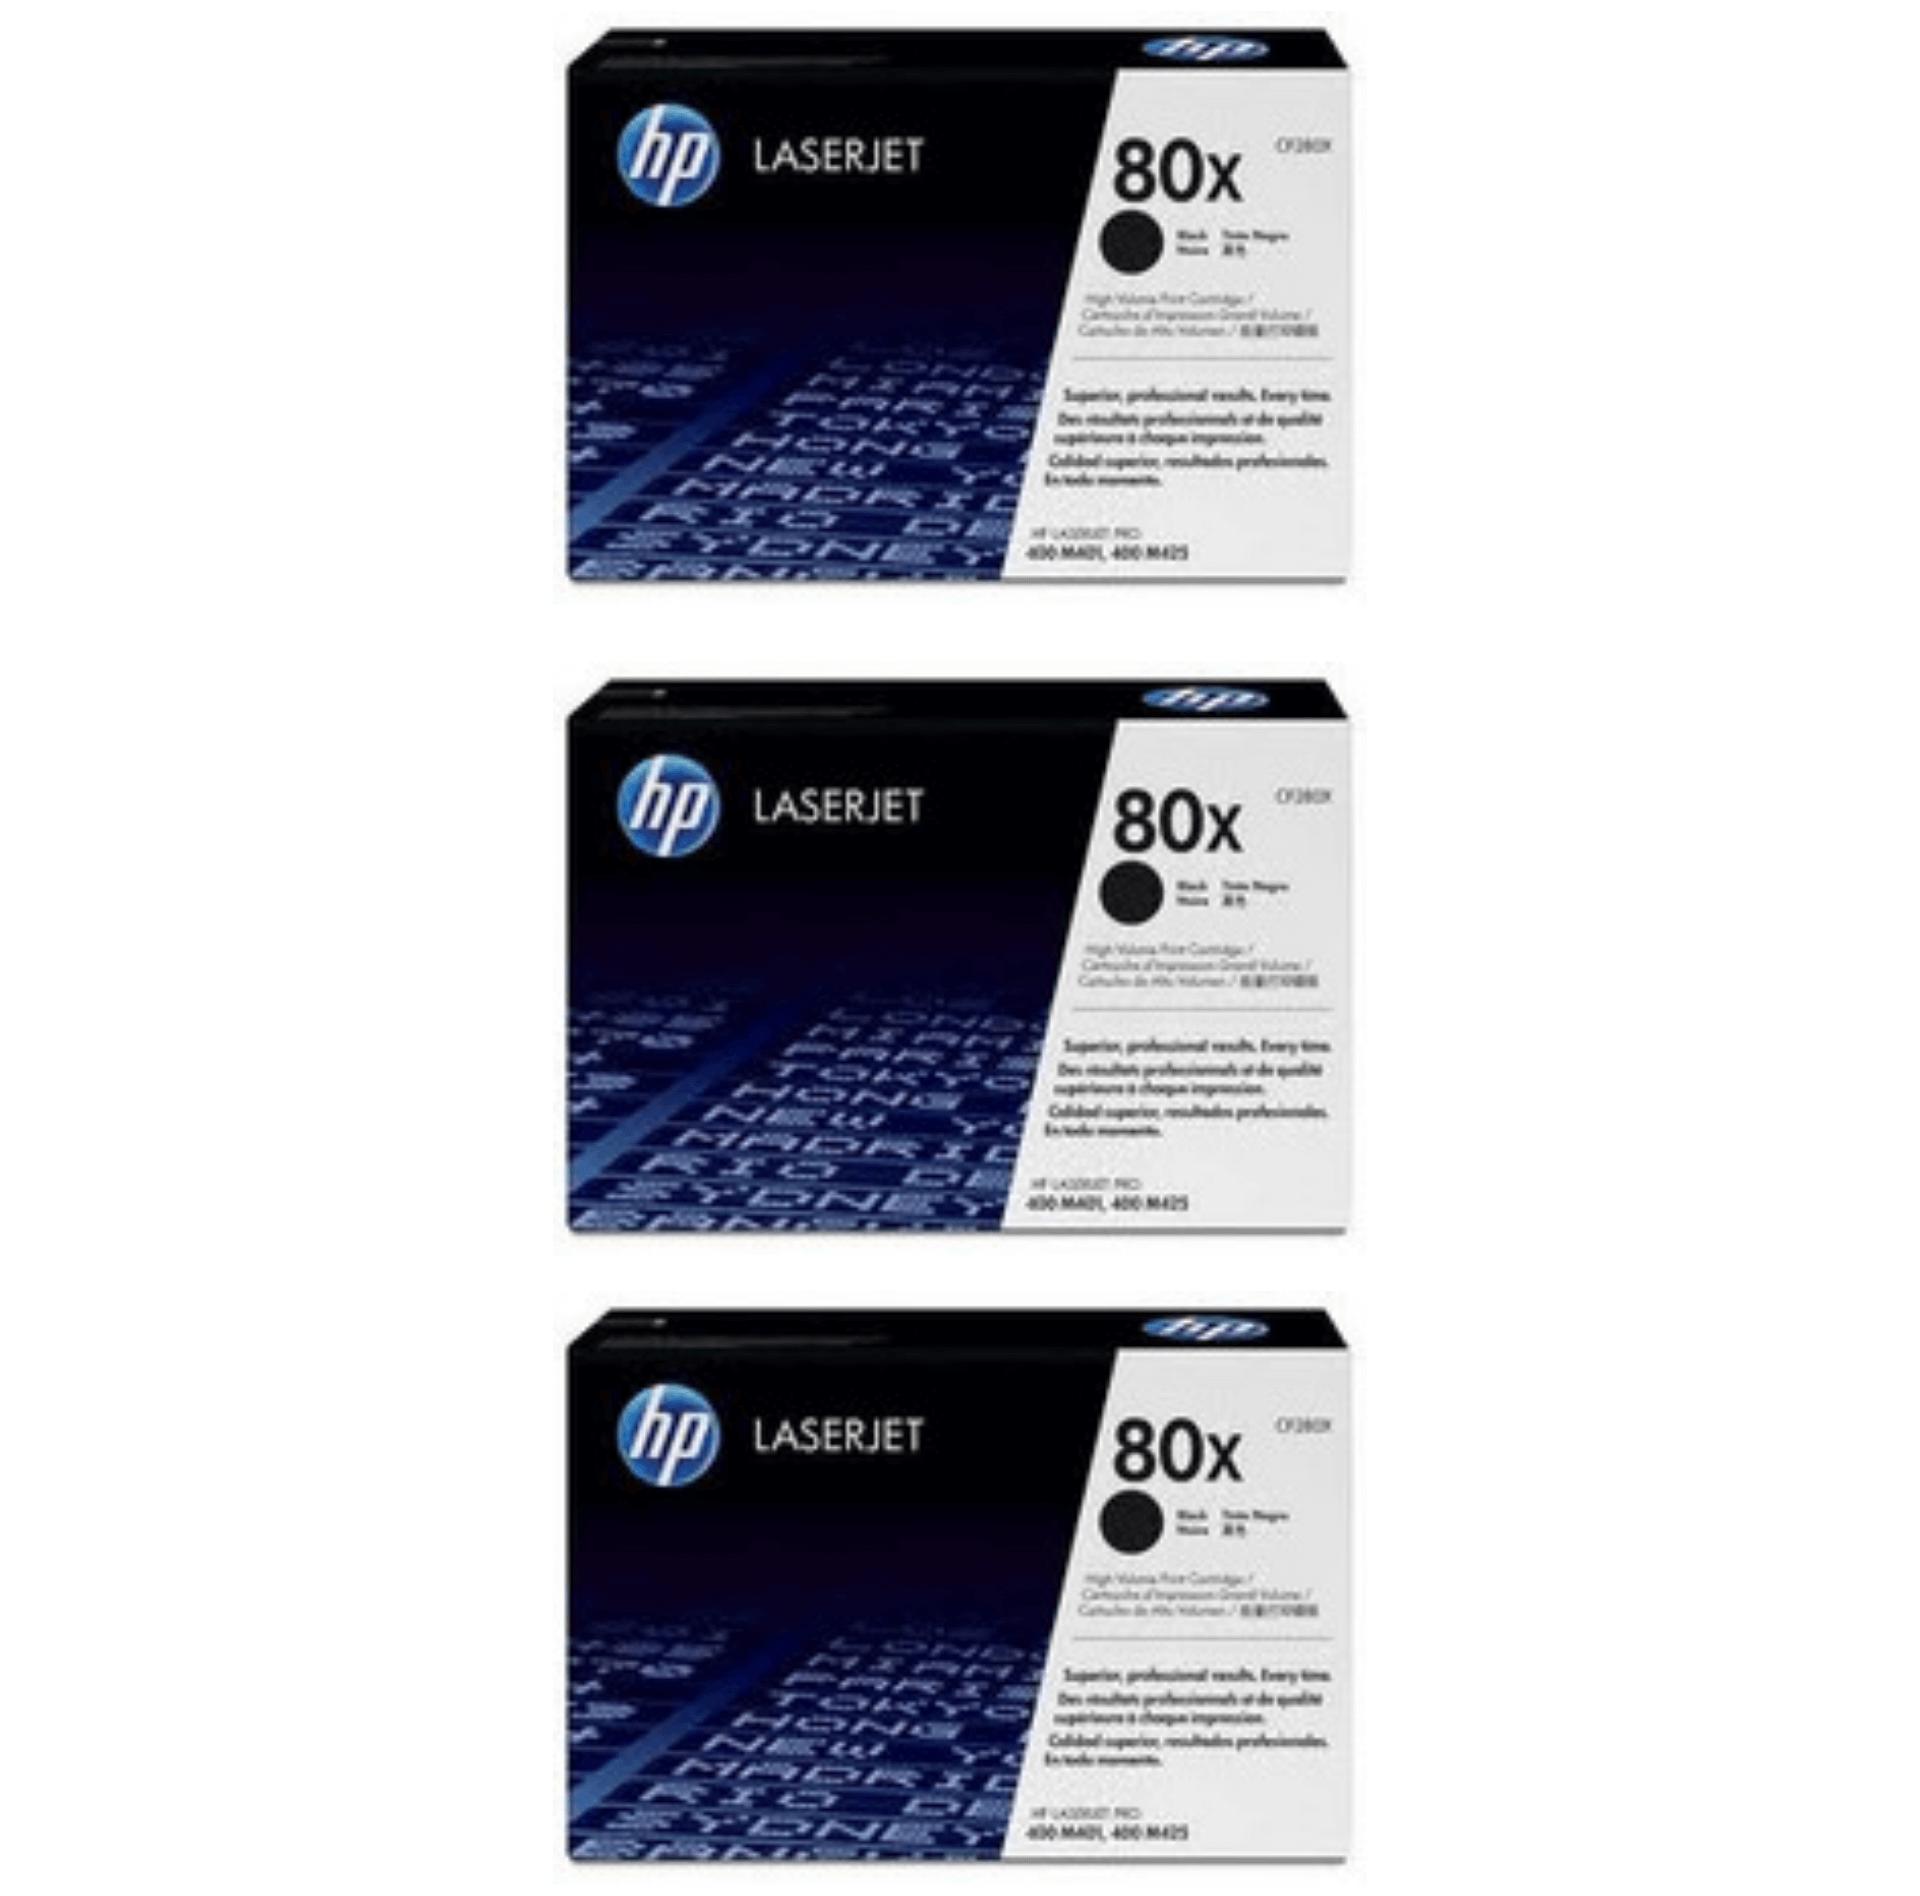 HP 80X Toner Cartridges Value Pack - Includes: [3 x Black]